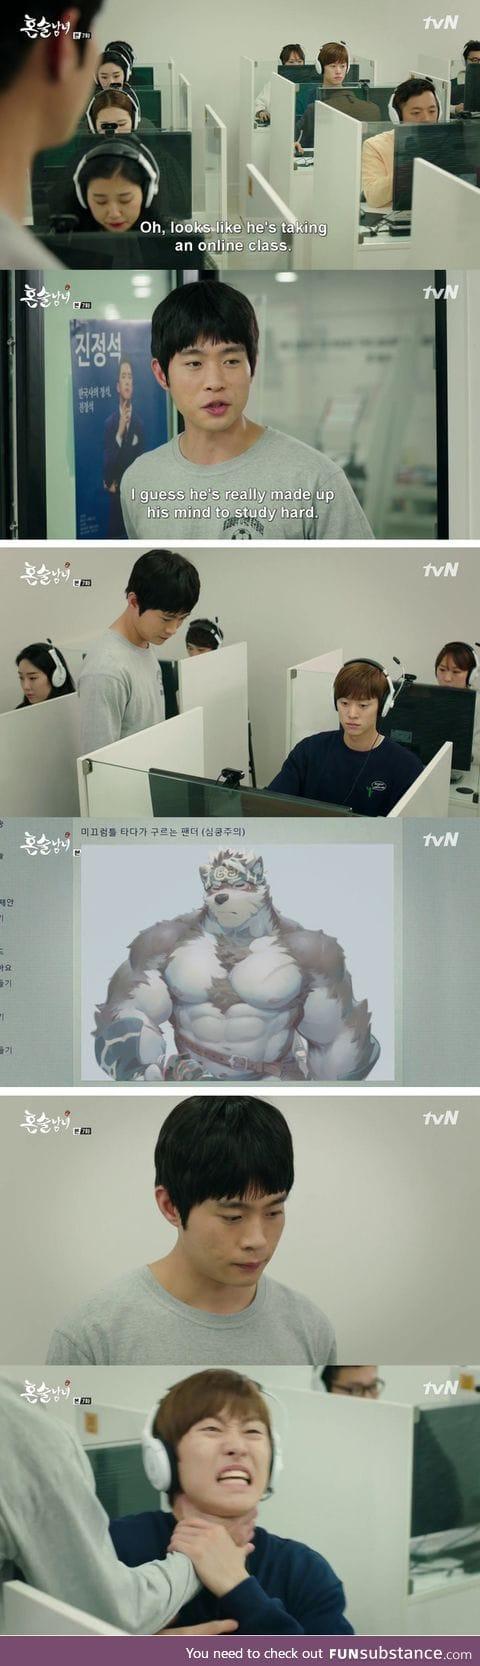 Taking online classes